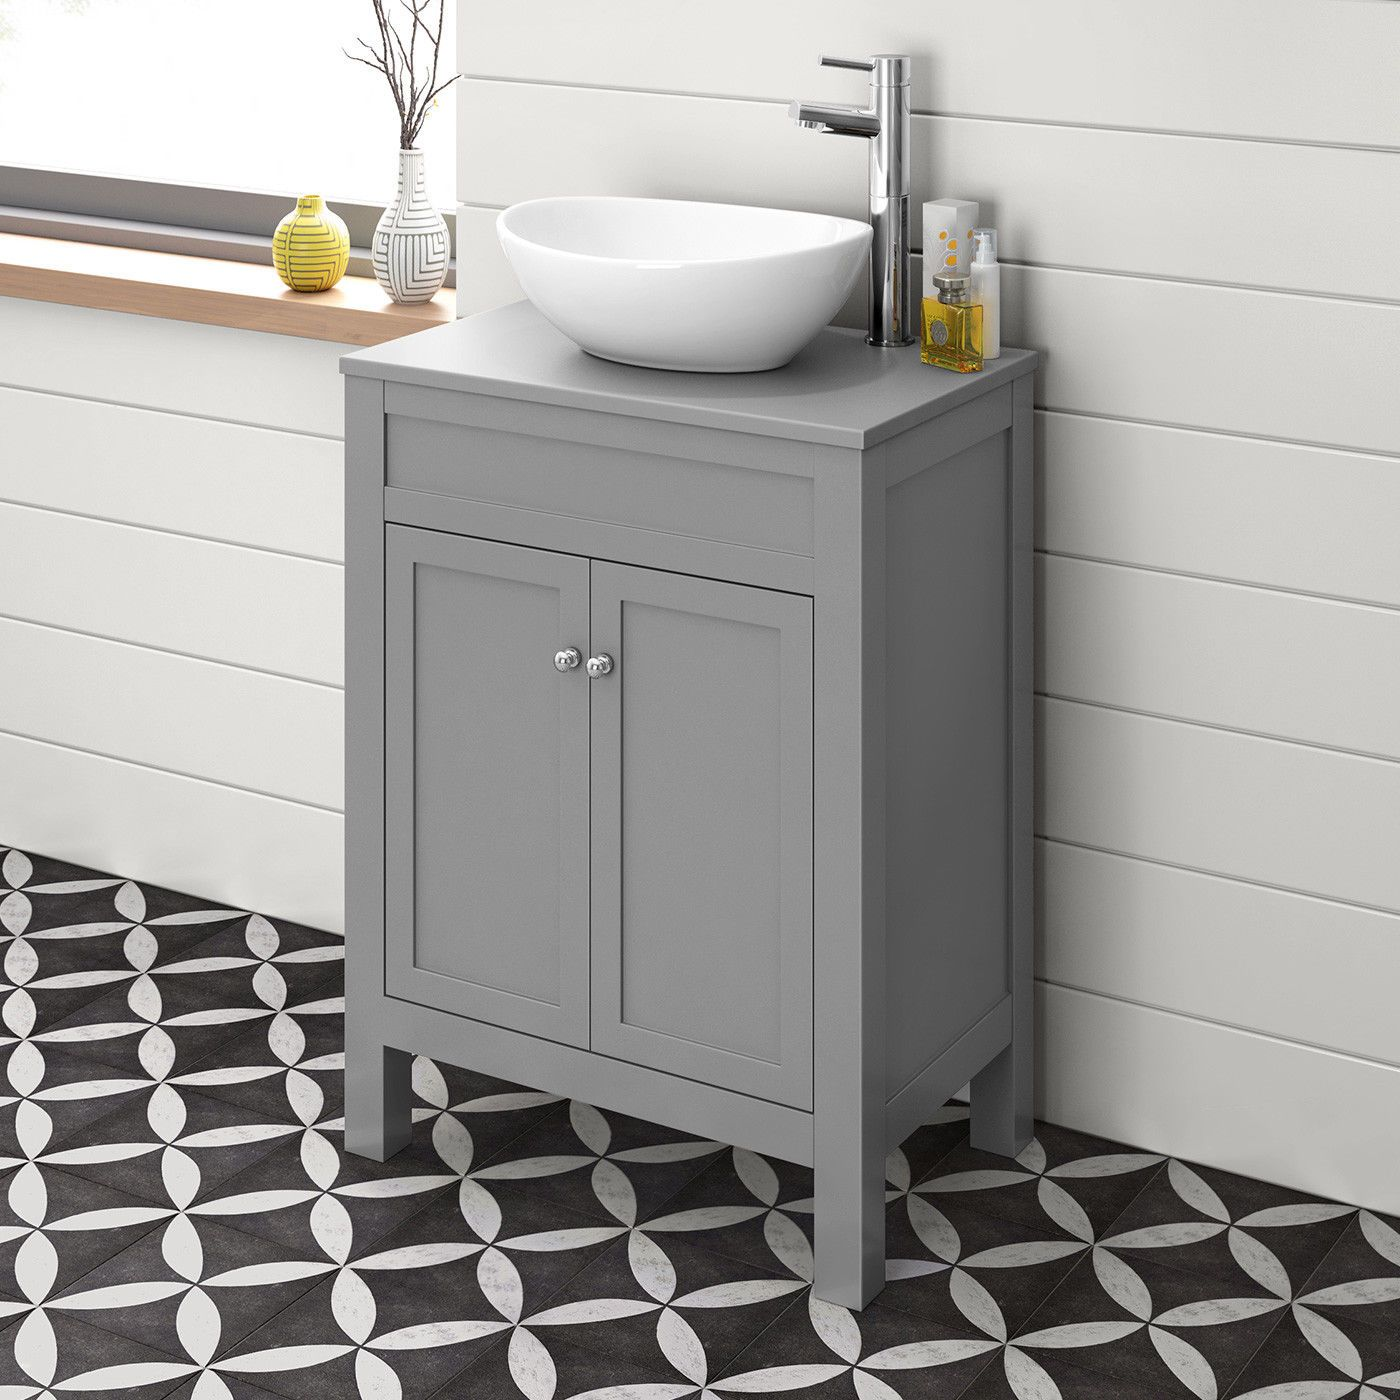 Modern Bathroom Vanity Unit Floorstanding Grey Sink Countertop Basin Furniture Ebay Grey Countertops Grey Vanity Unit Countertop Basin